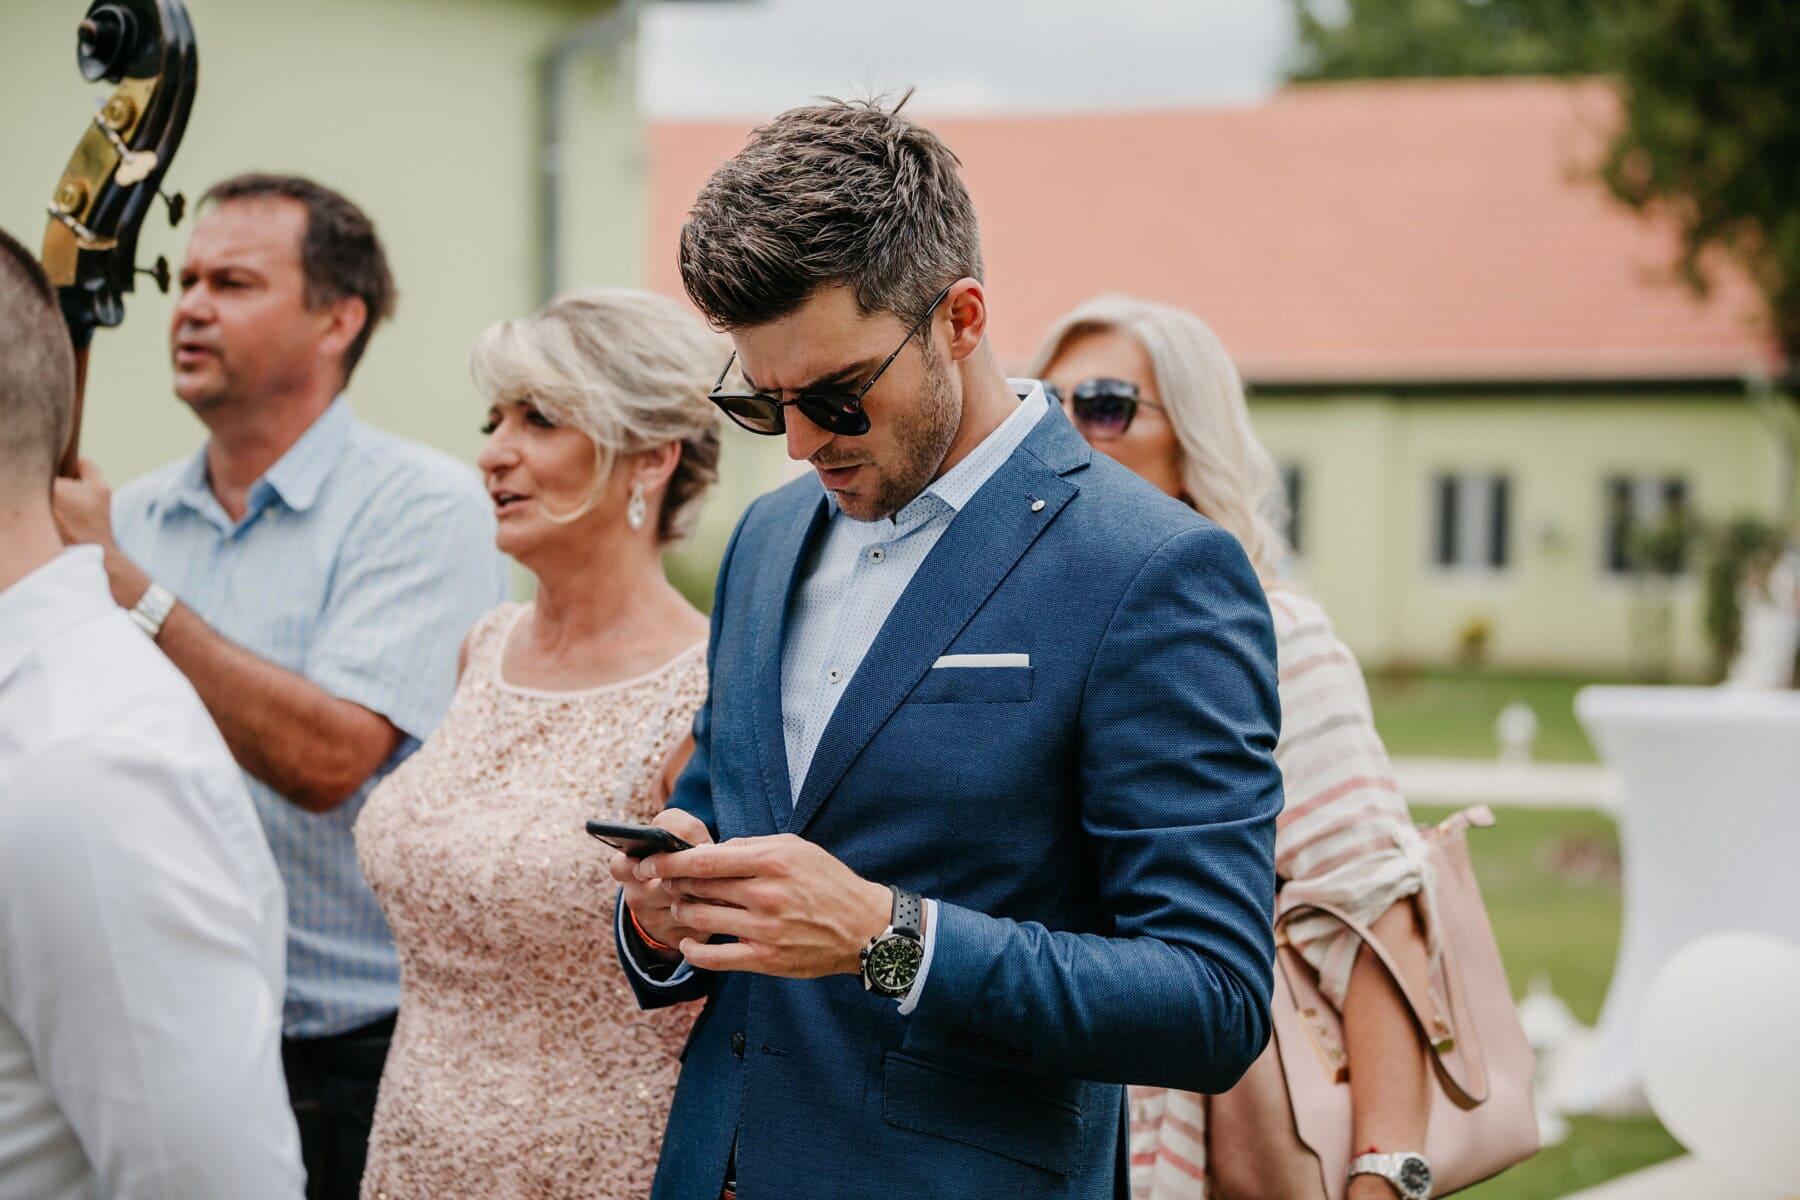 businessman, handsome, mobile phone, crowd, woman, executive, meeting, man, business, secretary